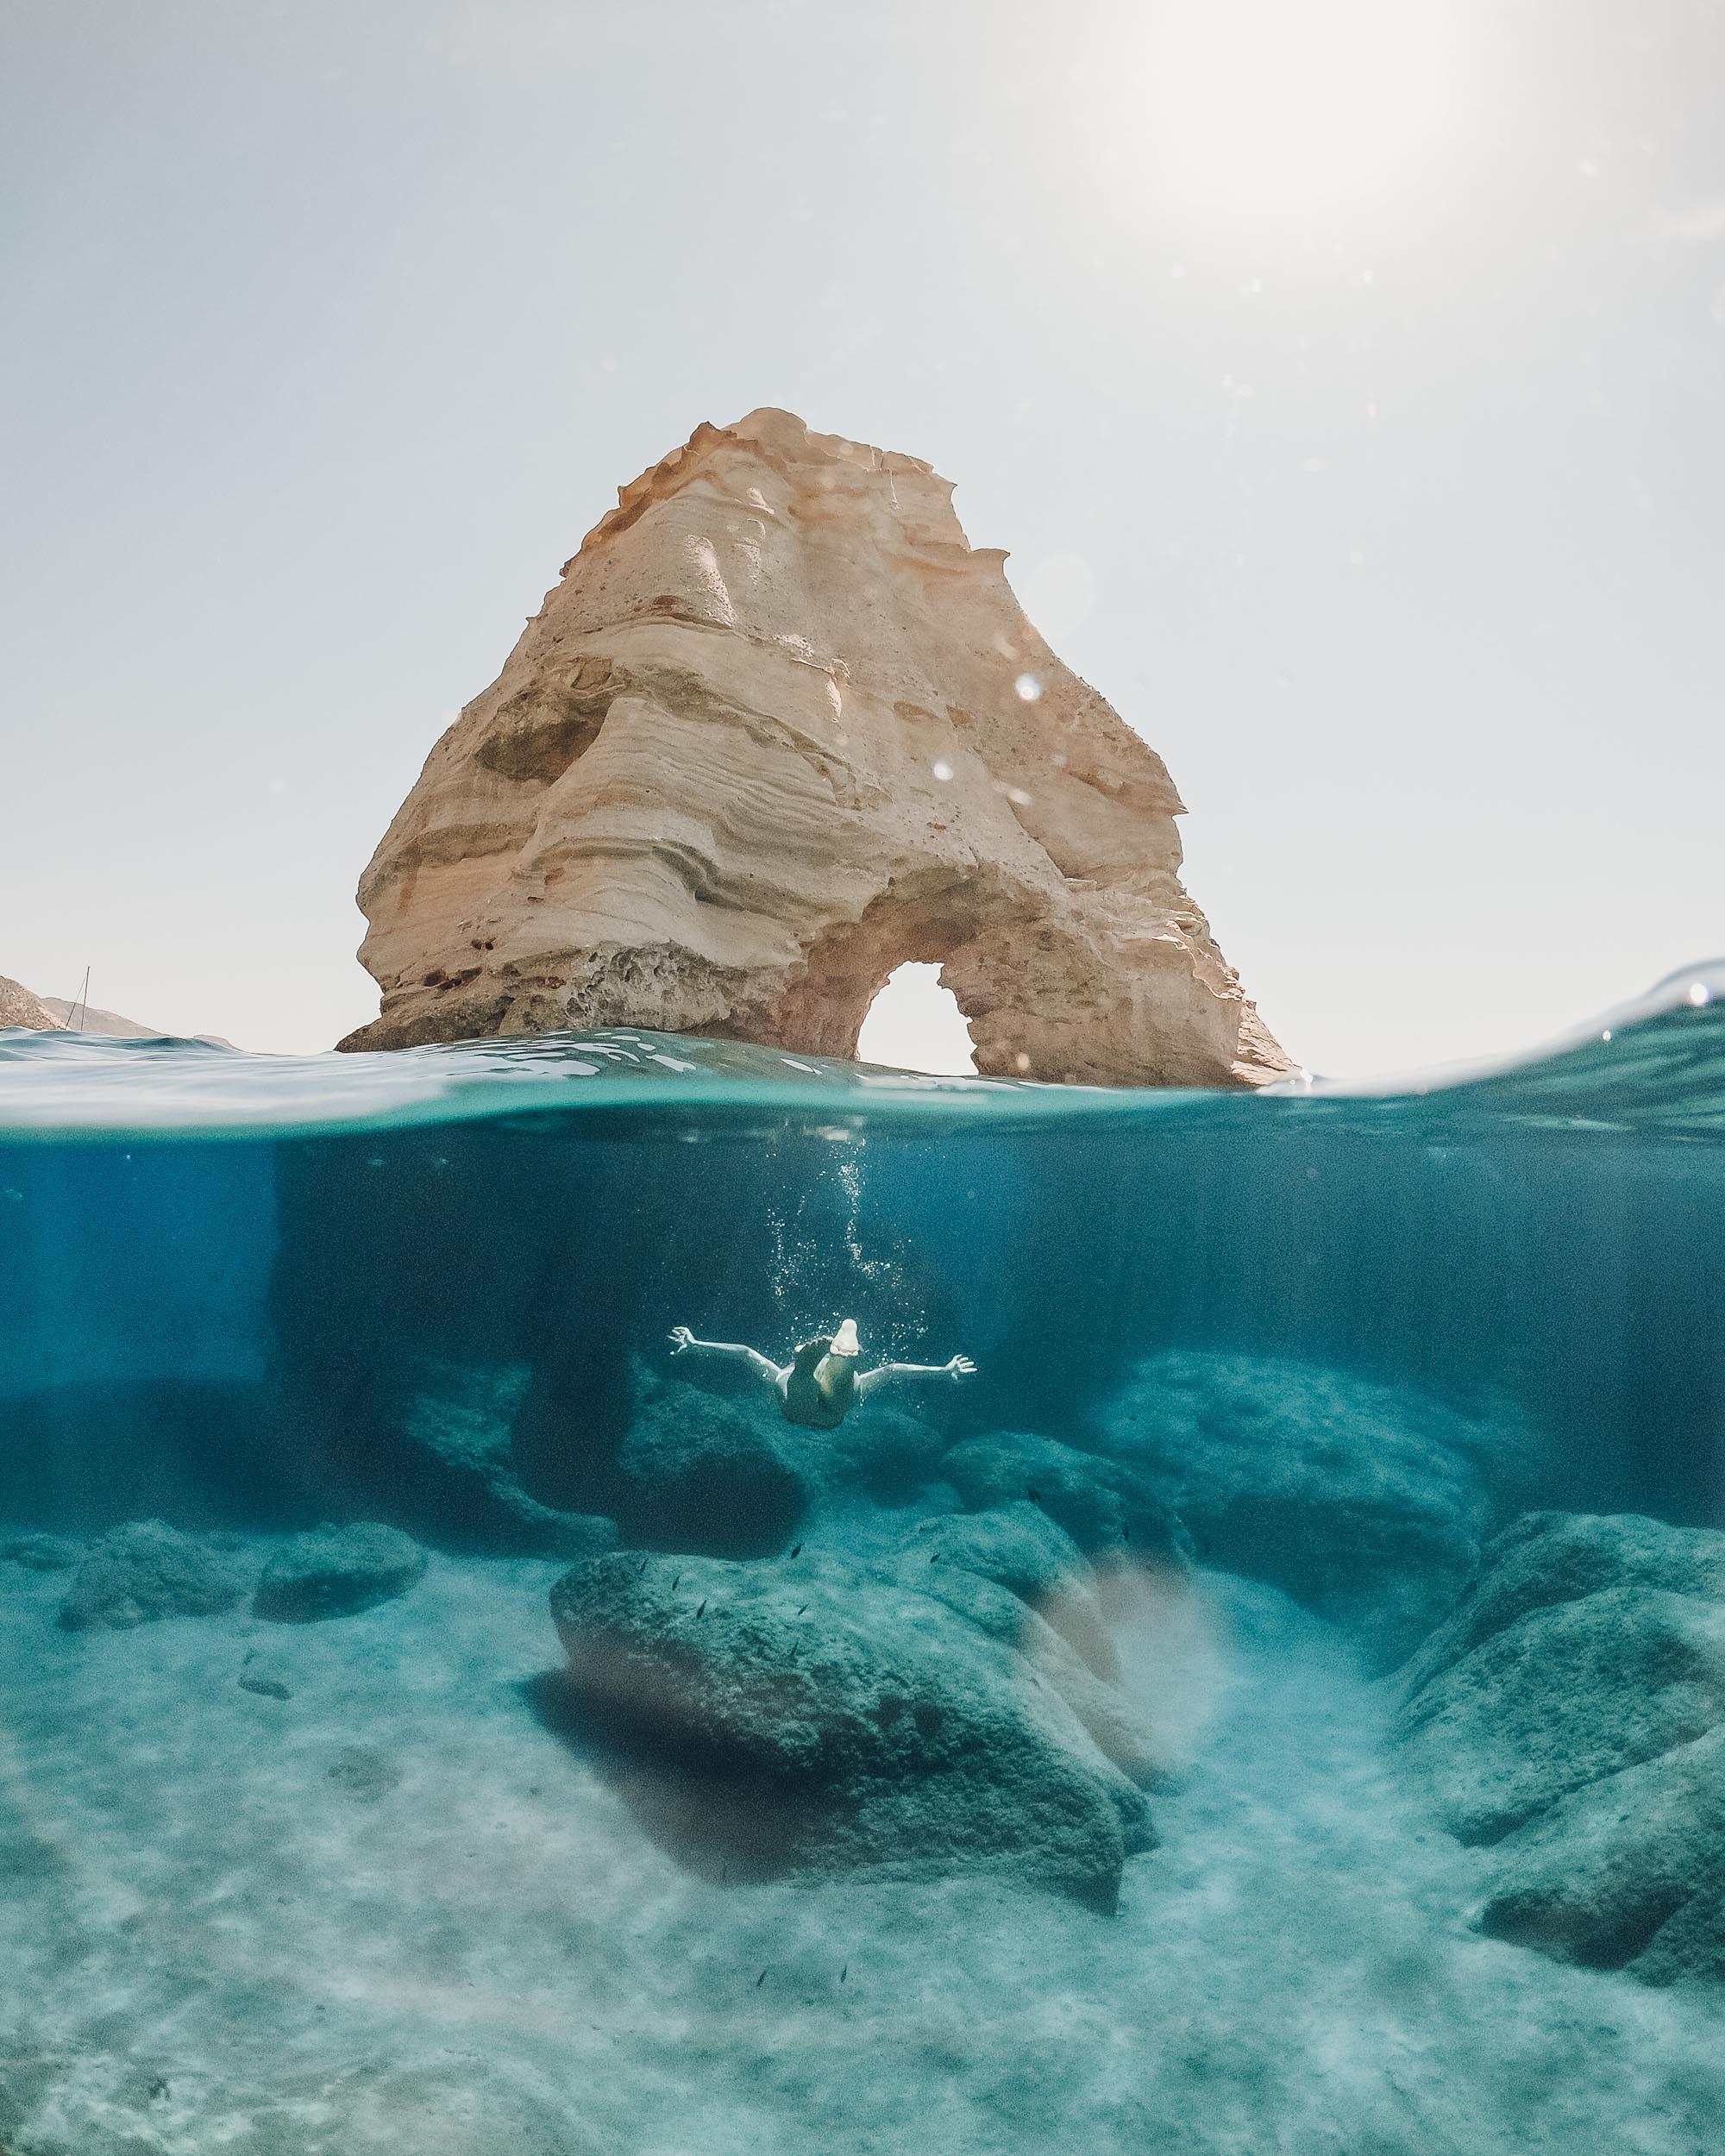 Kleftiko caves in Milos, Greece via @finduslost